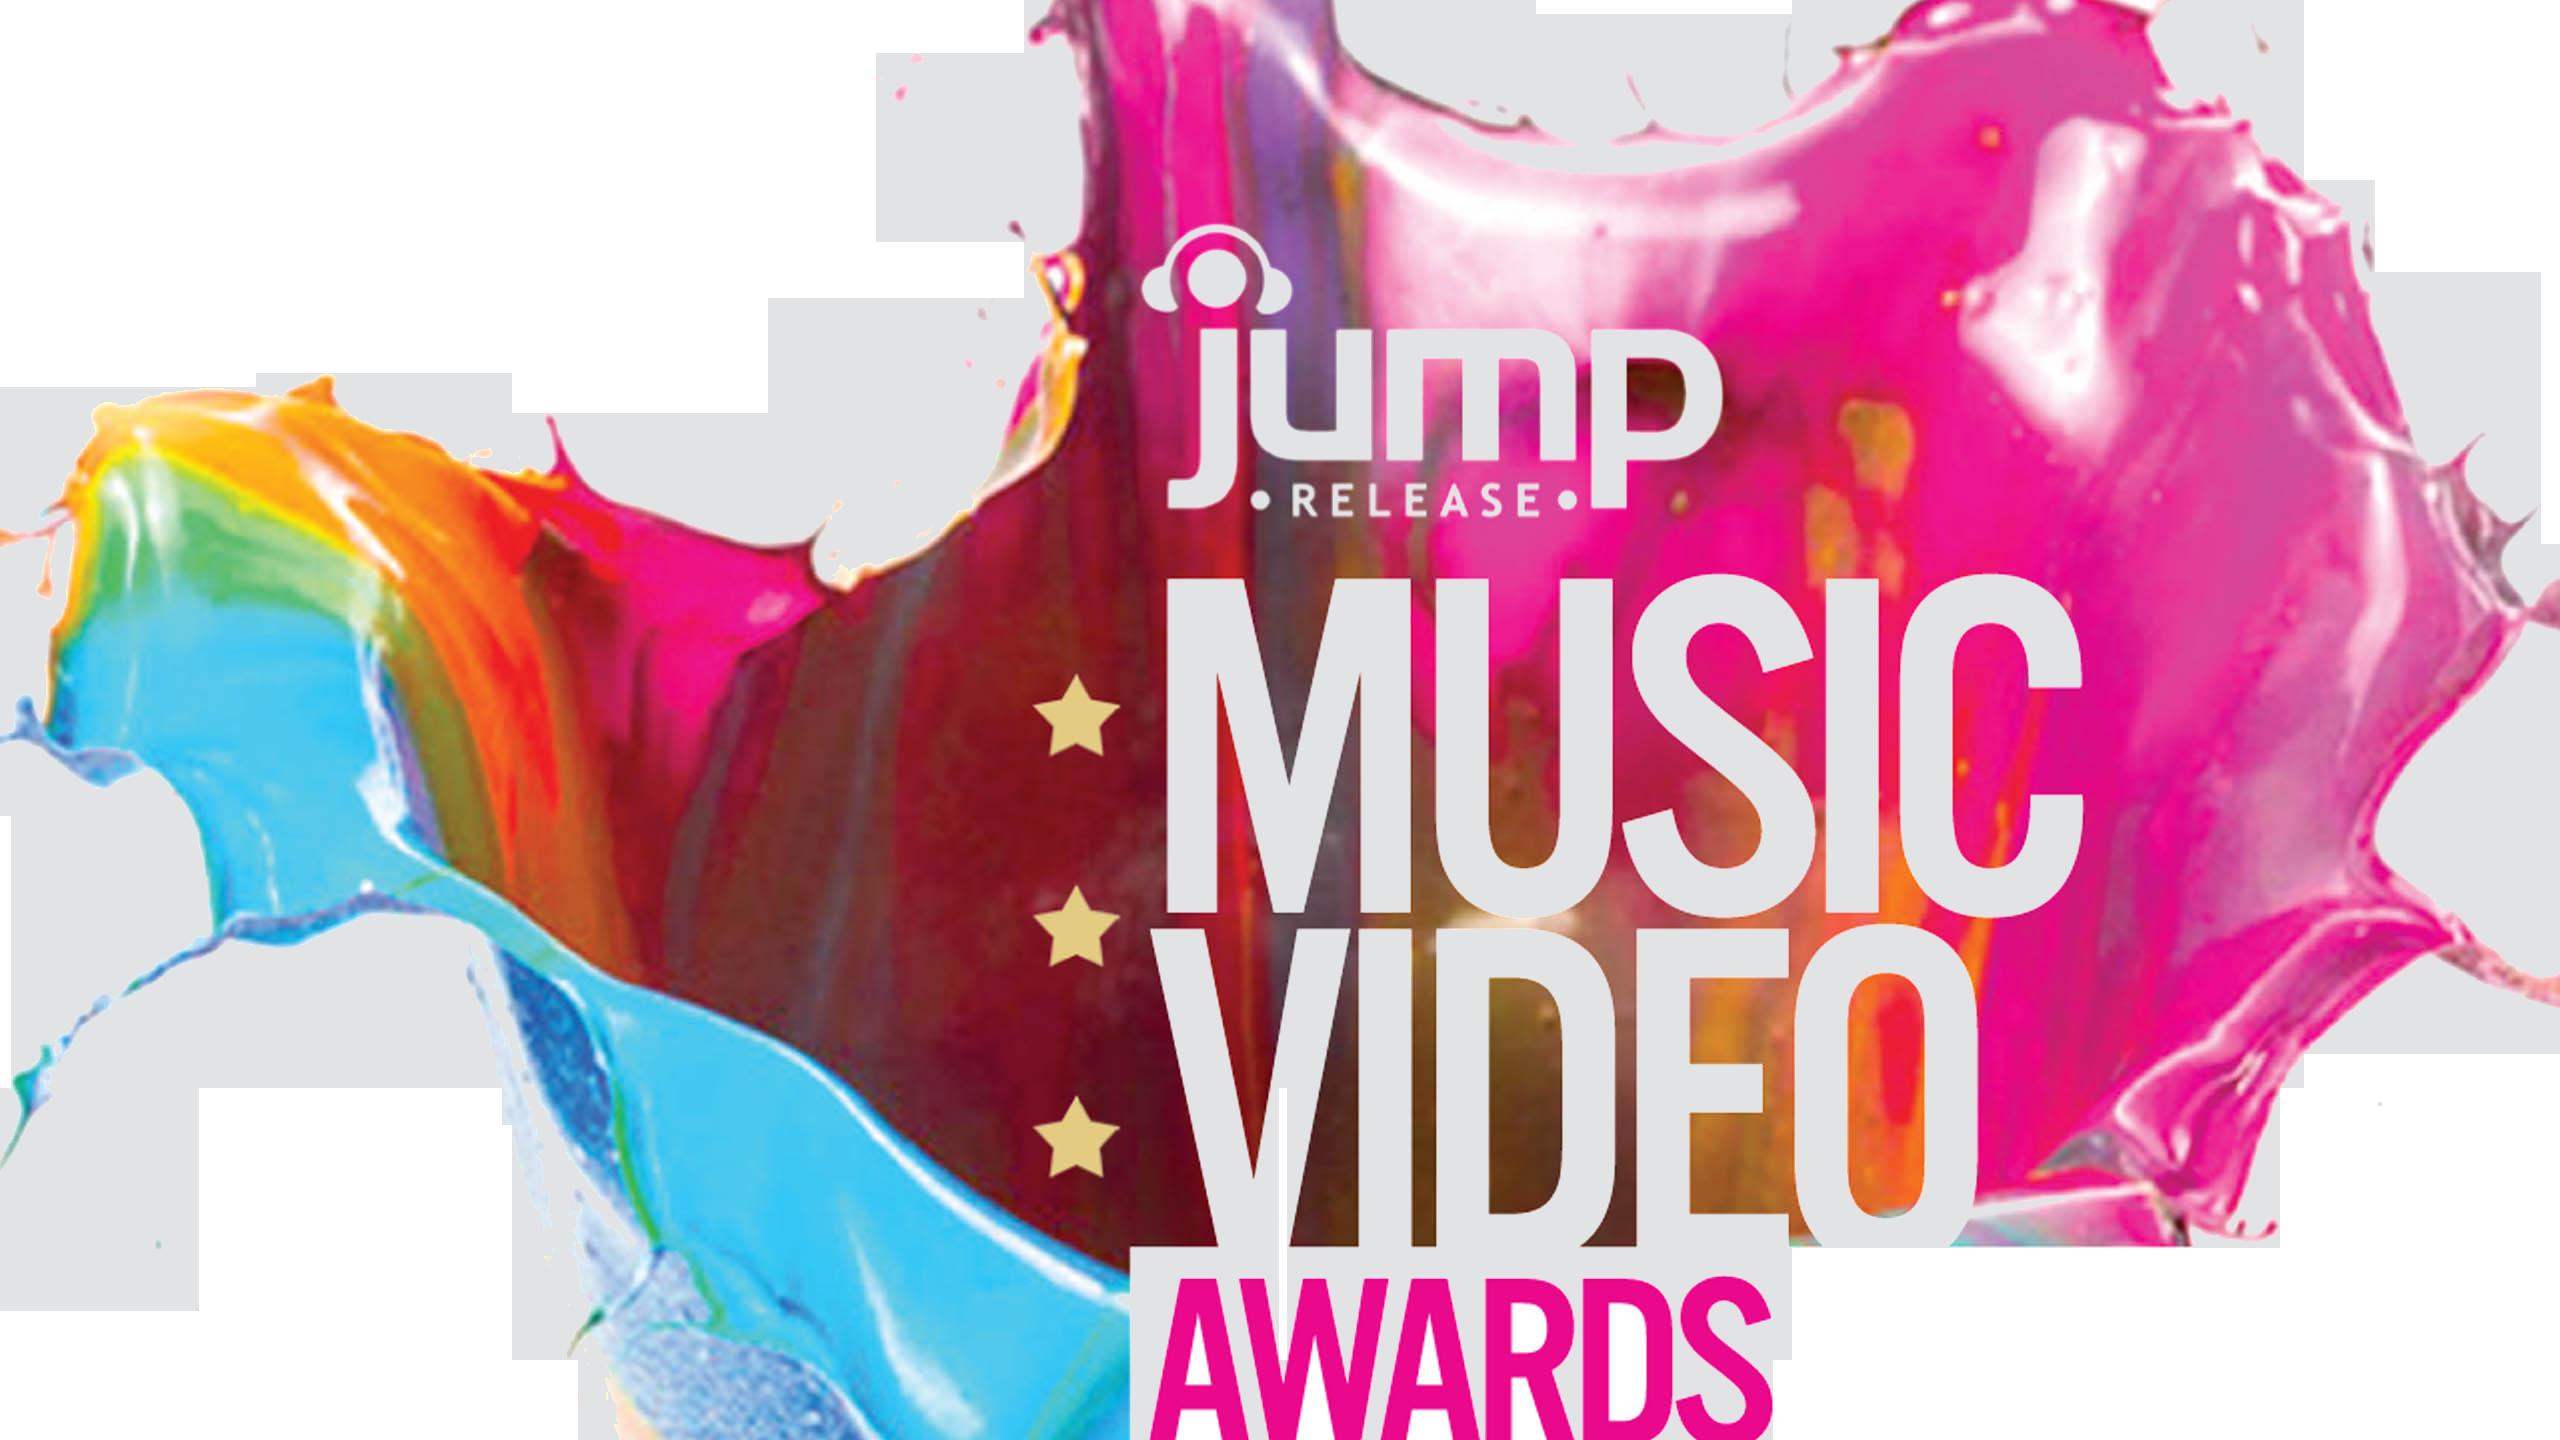 JUMP MUSIC VIDEO AWARDS 2019 - INTERNATIONAL